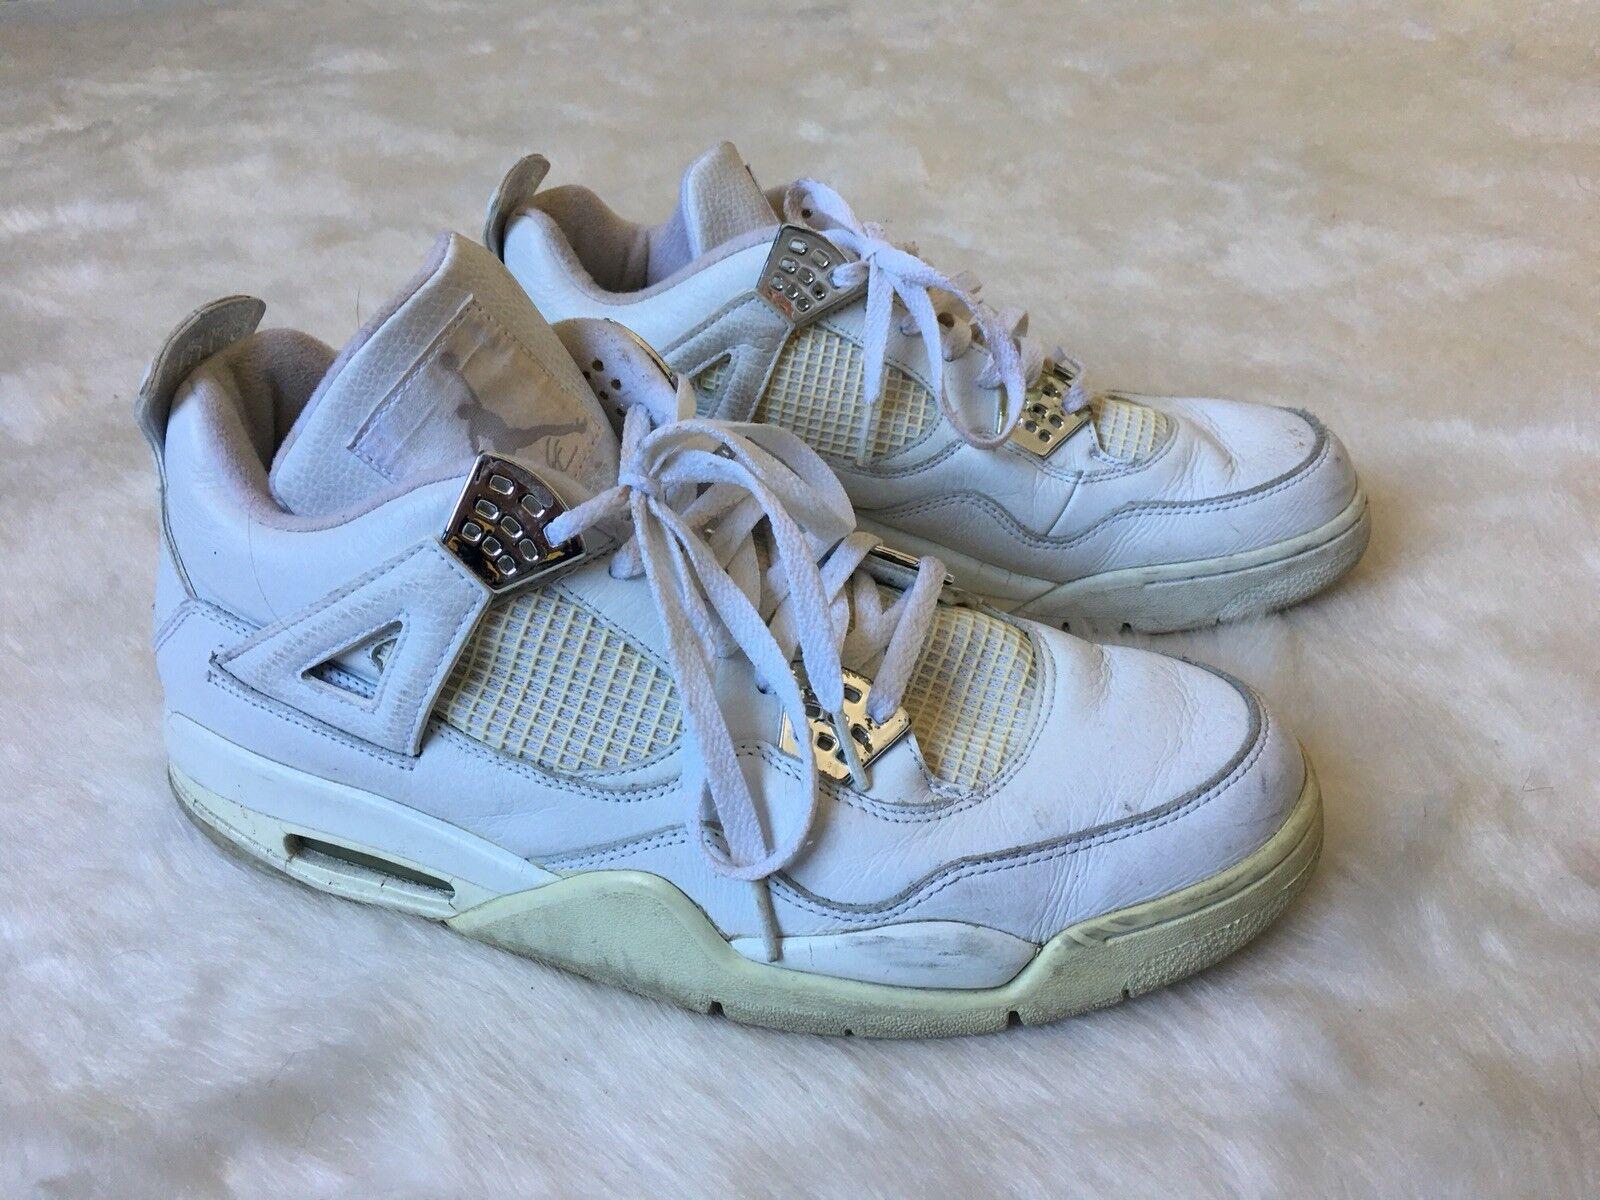 Nike air 12 jordan 1 'alto og taglia 12 air nero bianco 555088 006 cyber pennino d12fb8